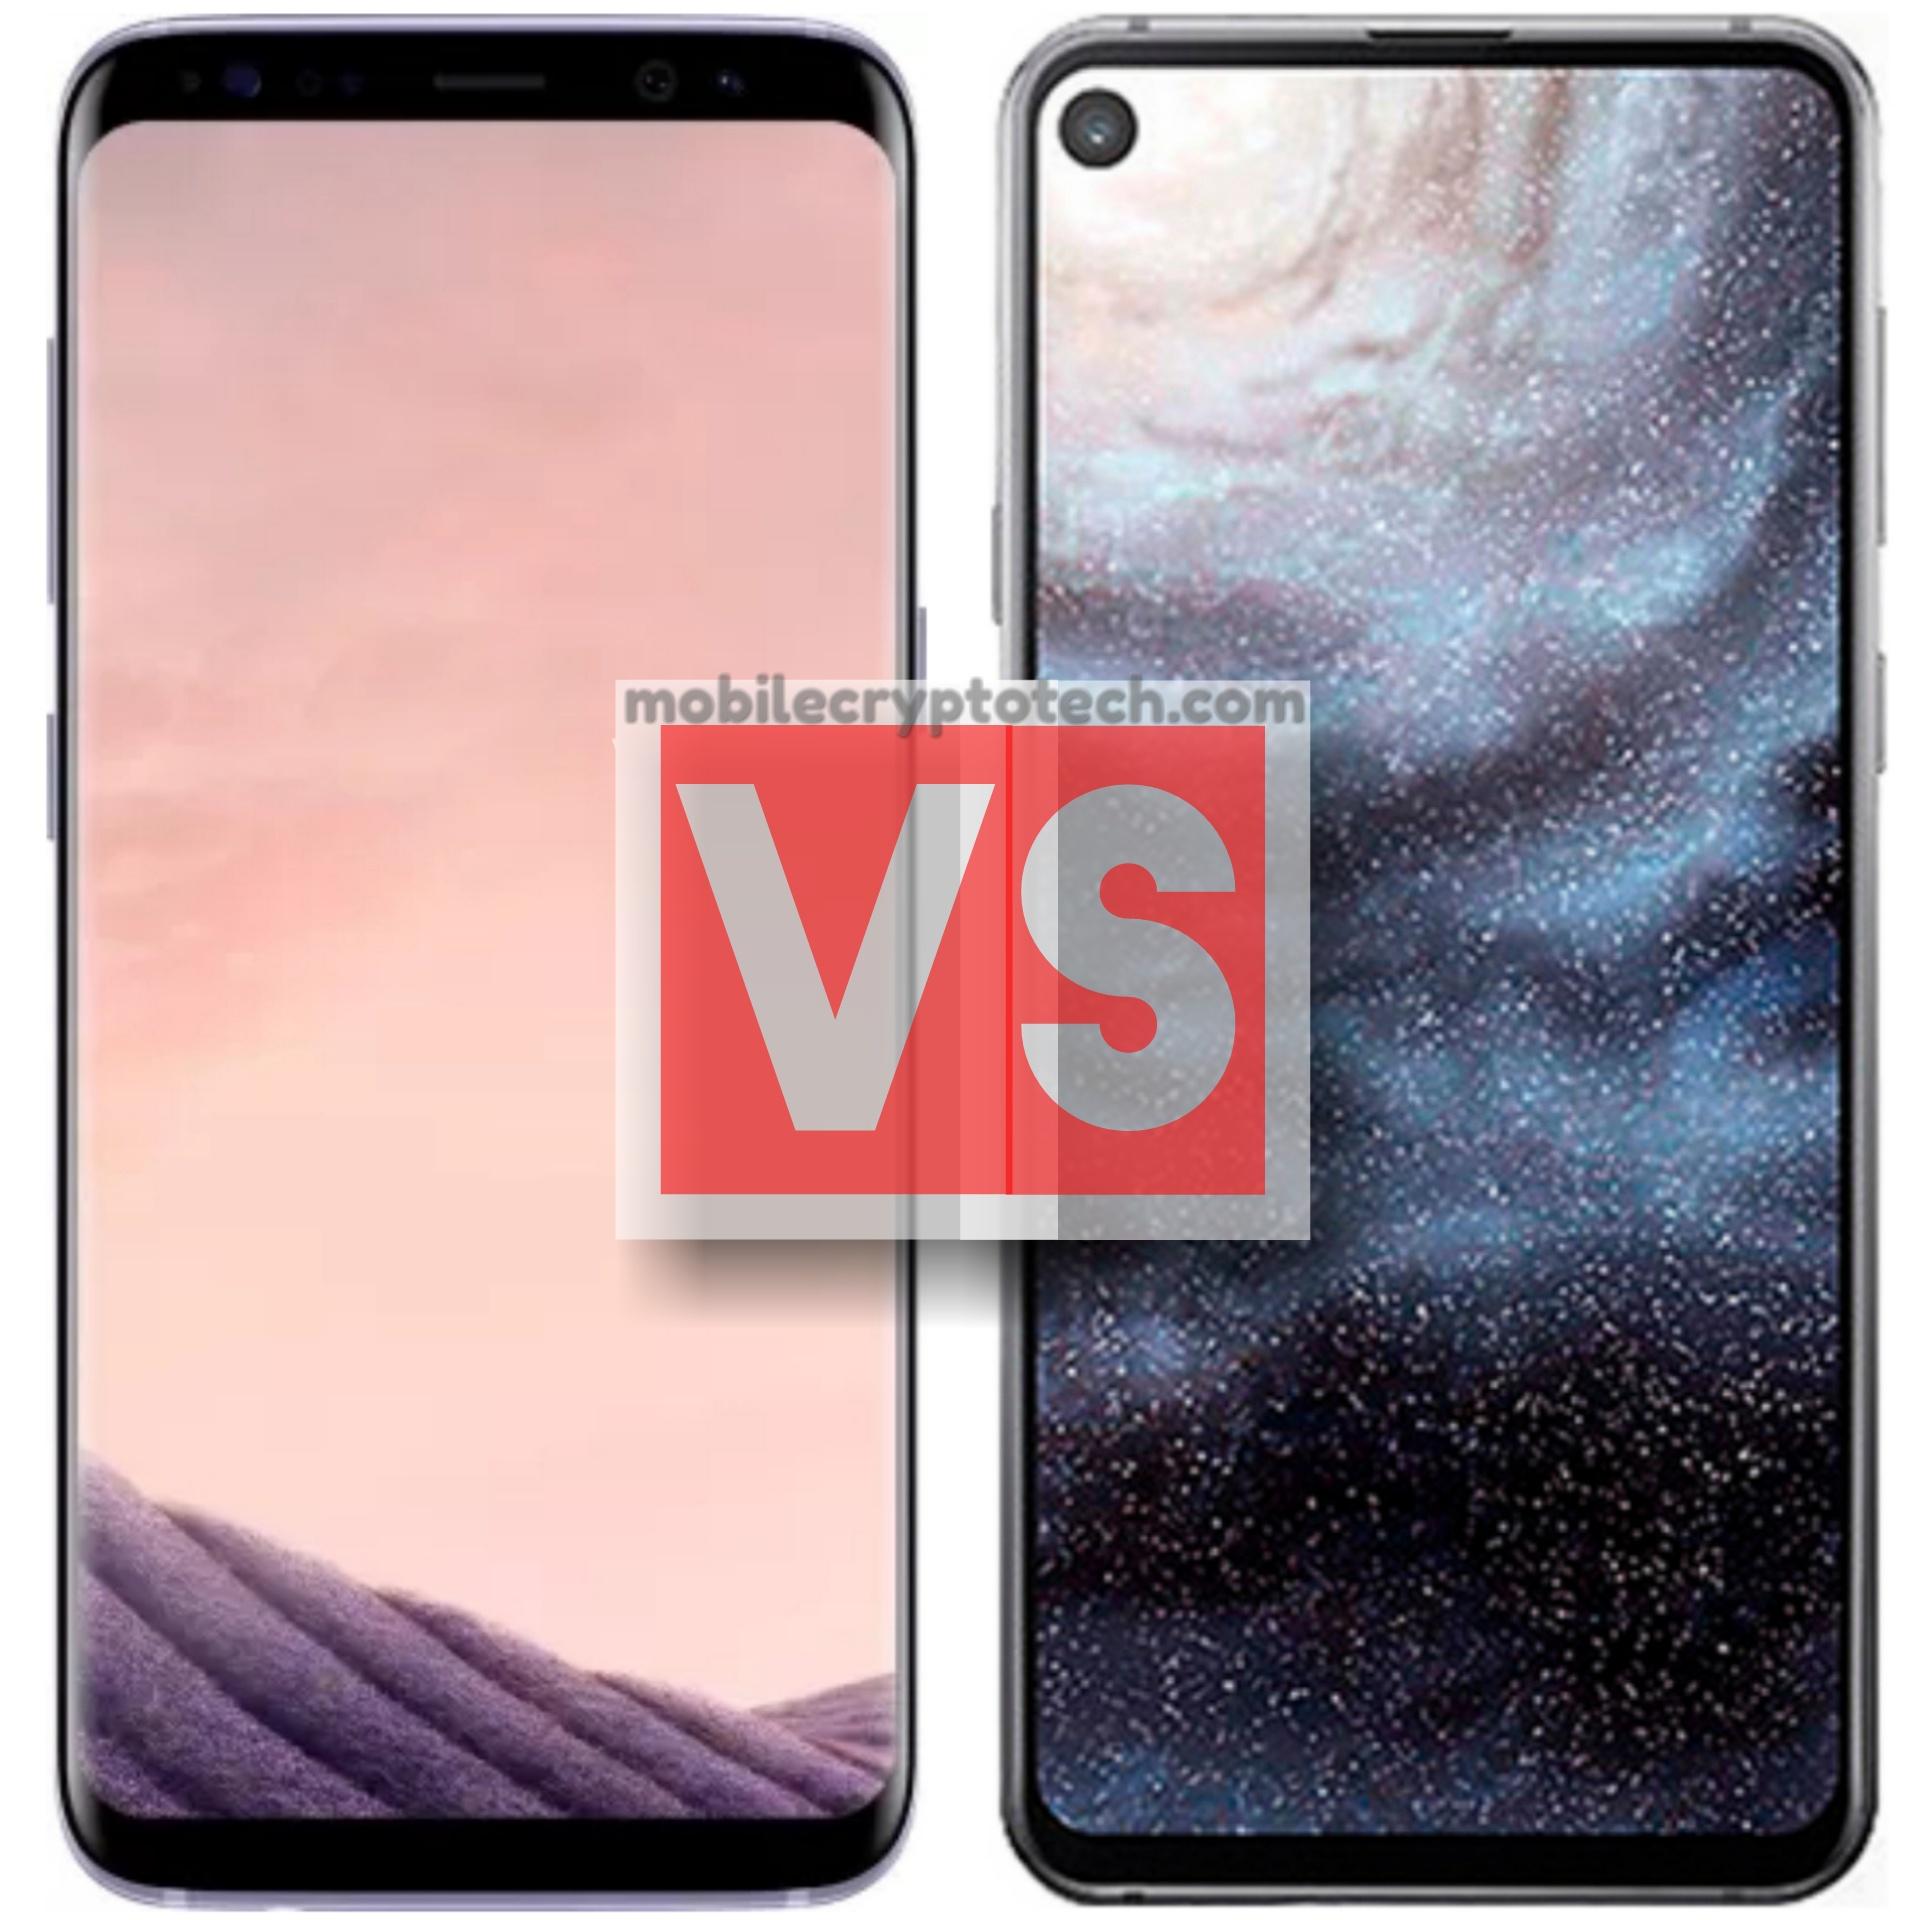 Samsung Galaxy S8 Plus Vs A8s